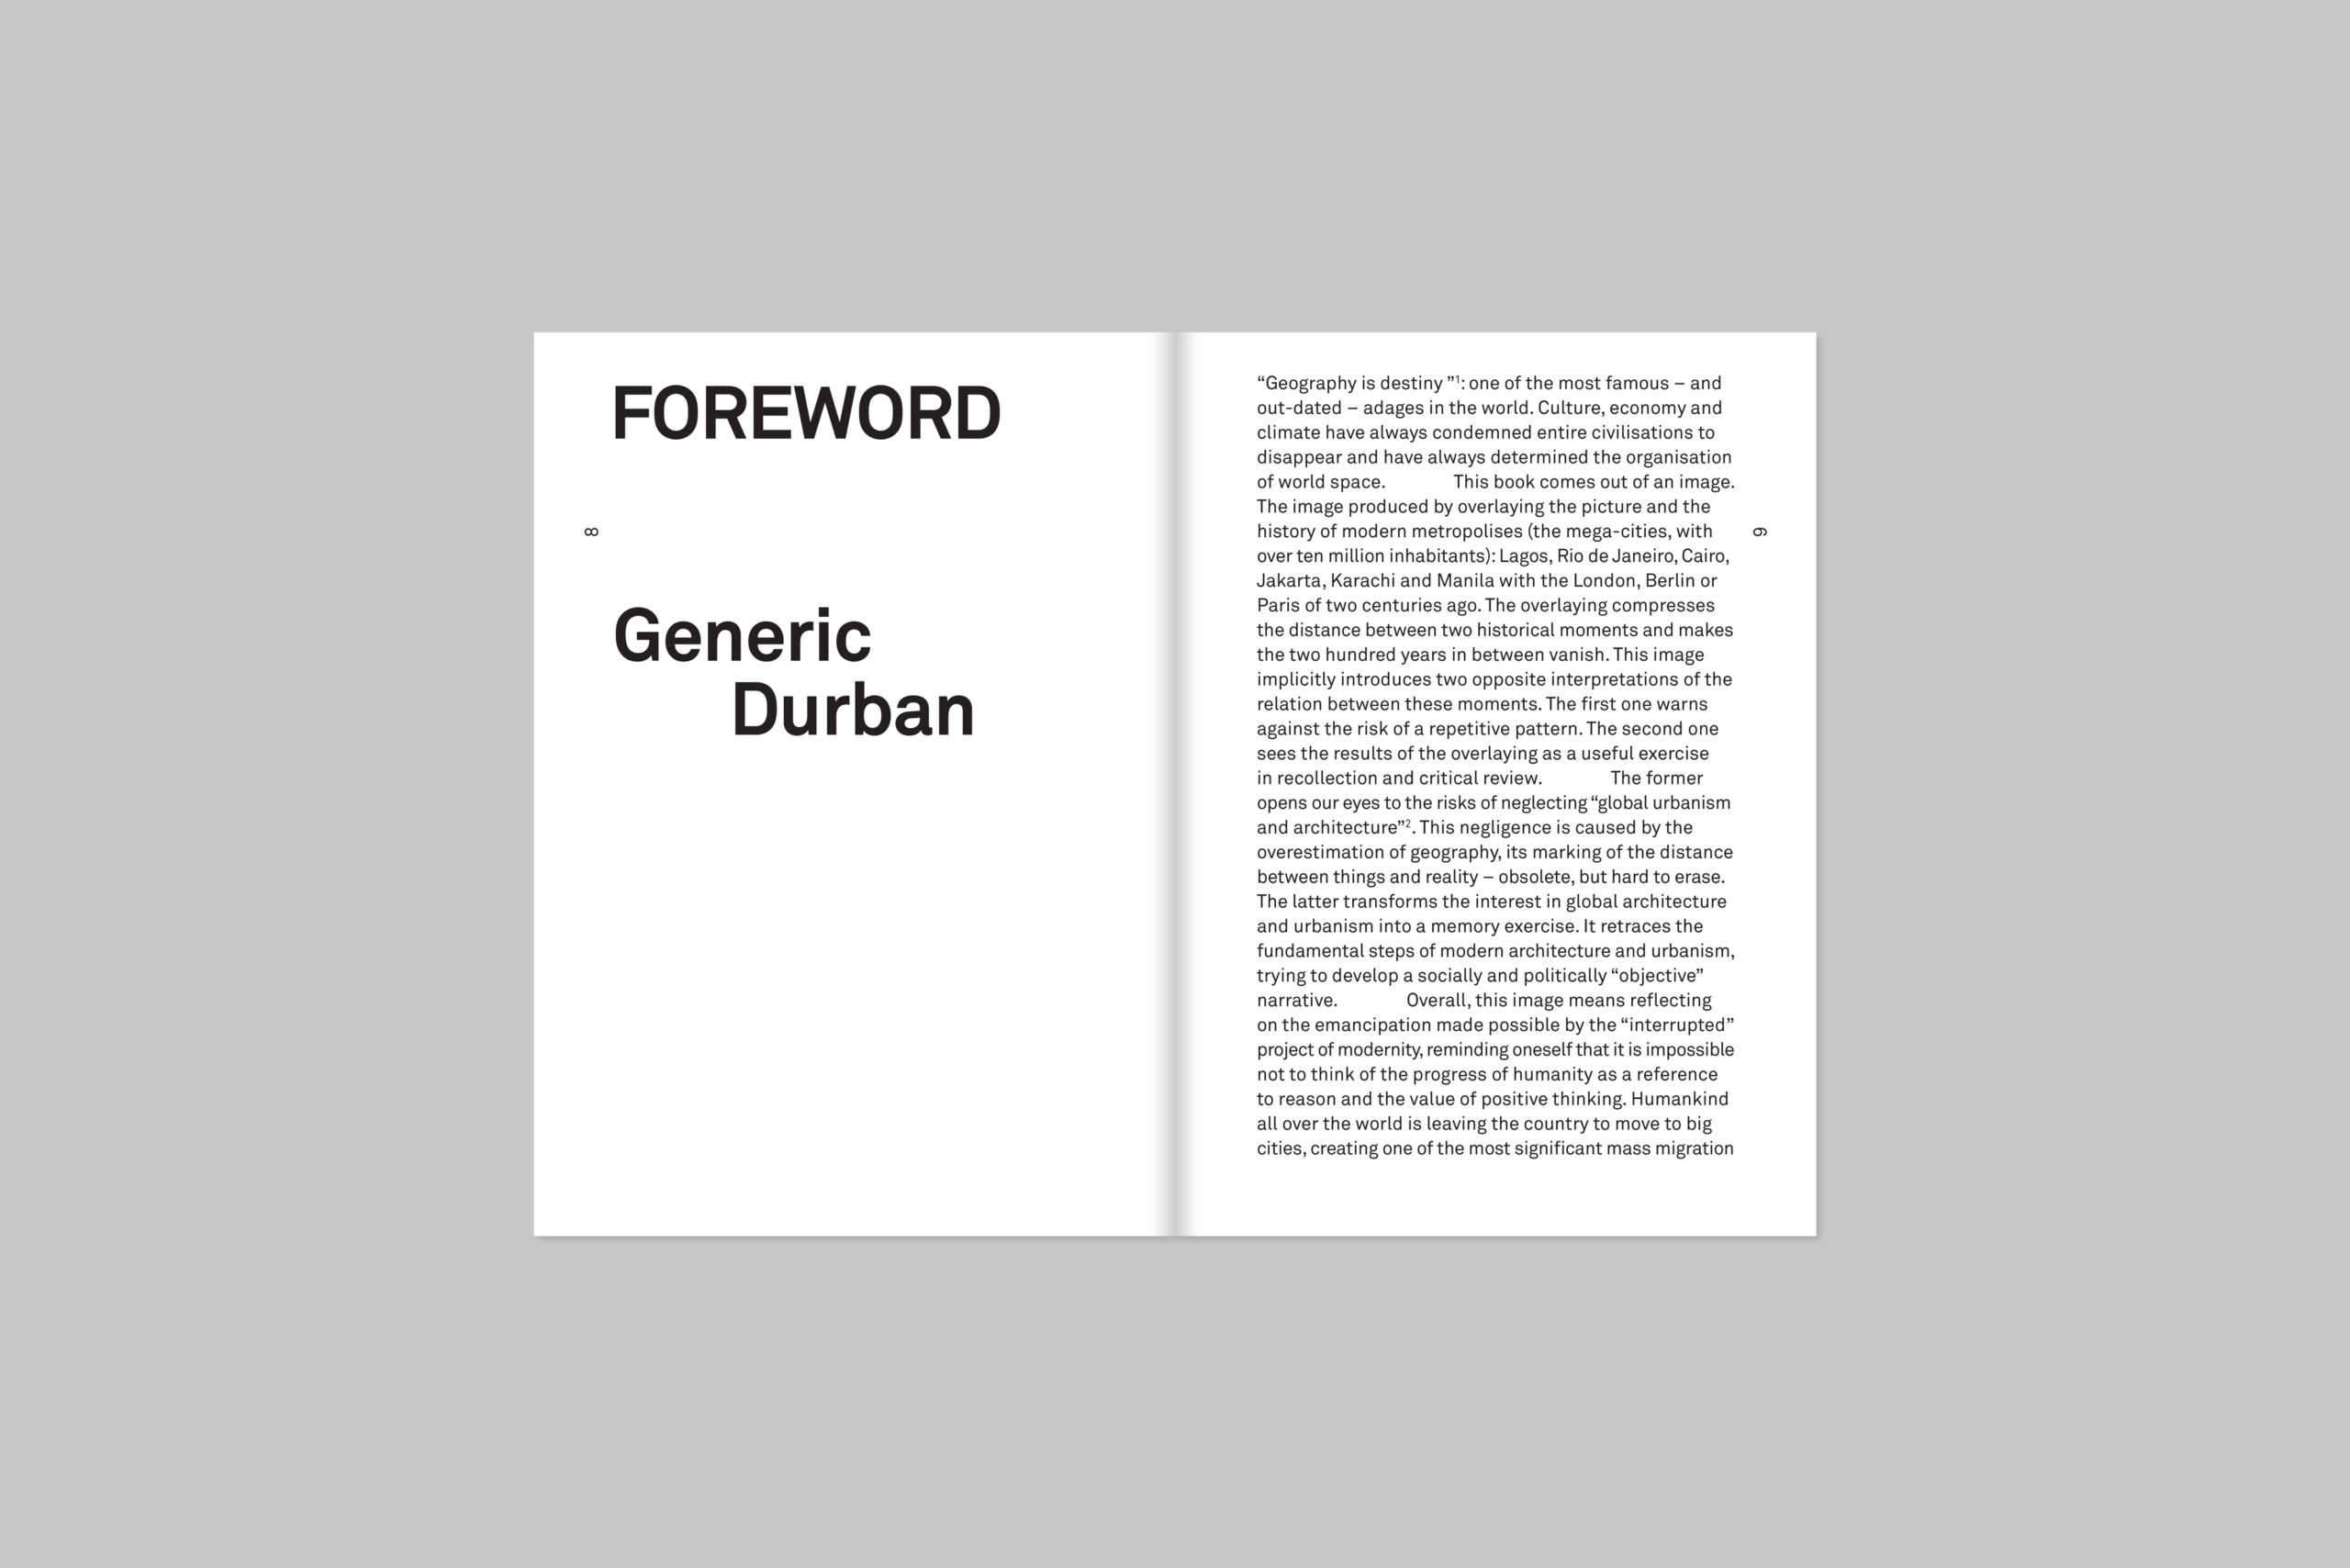 Durban2